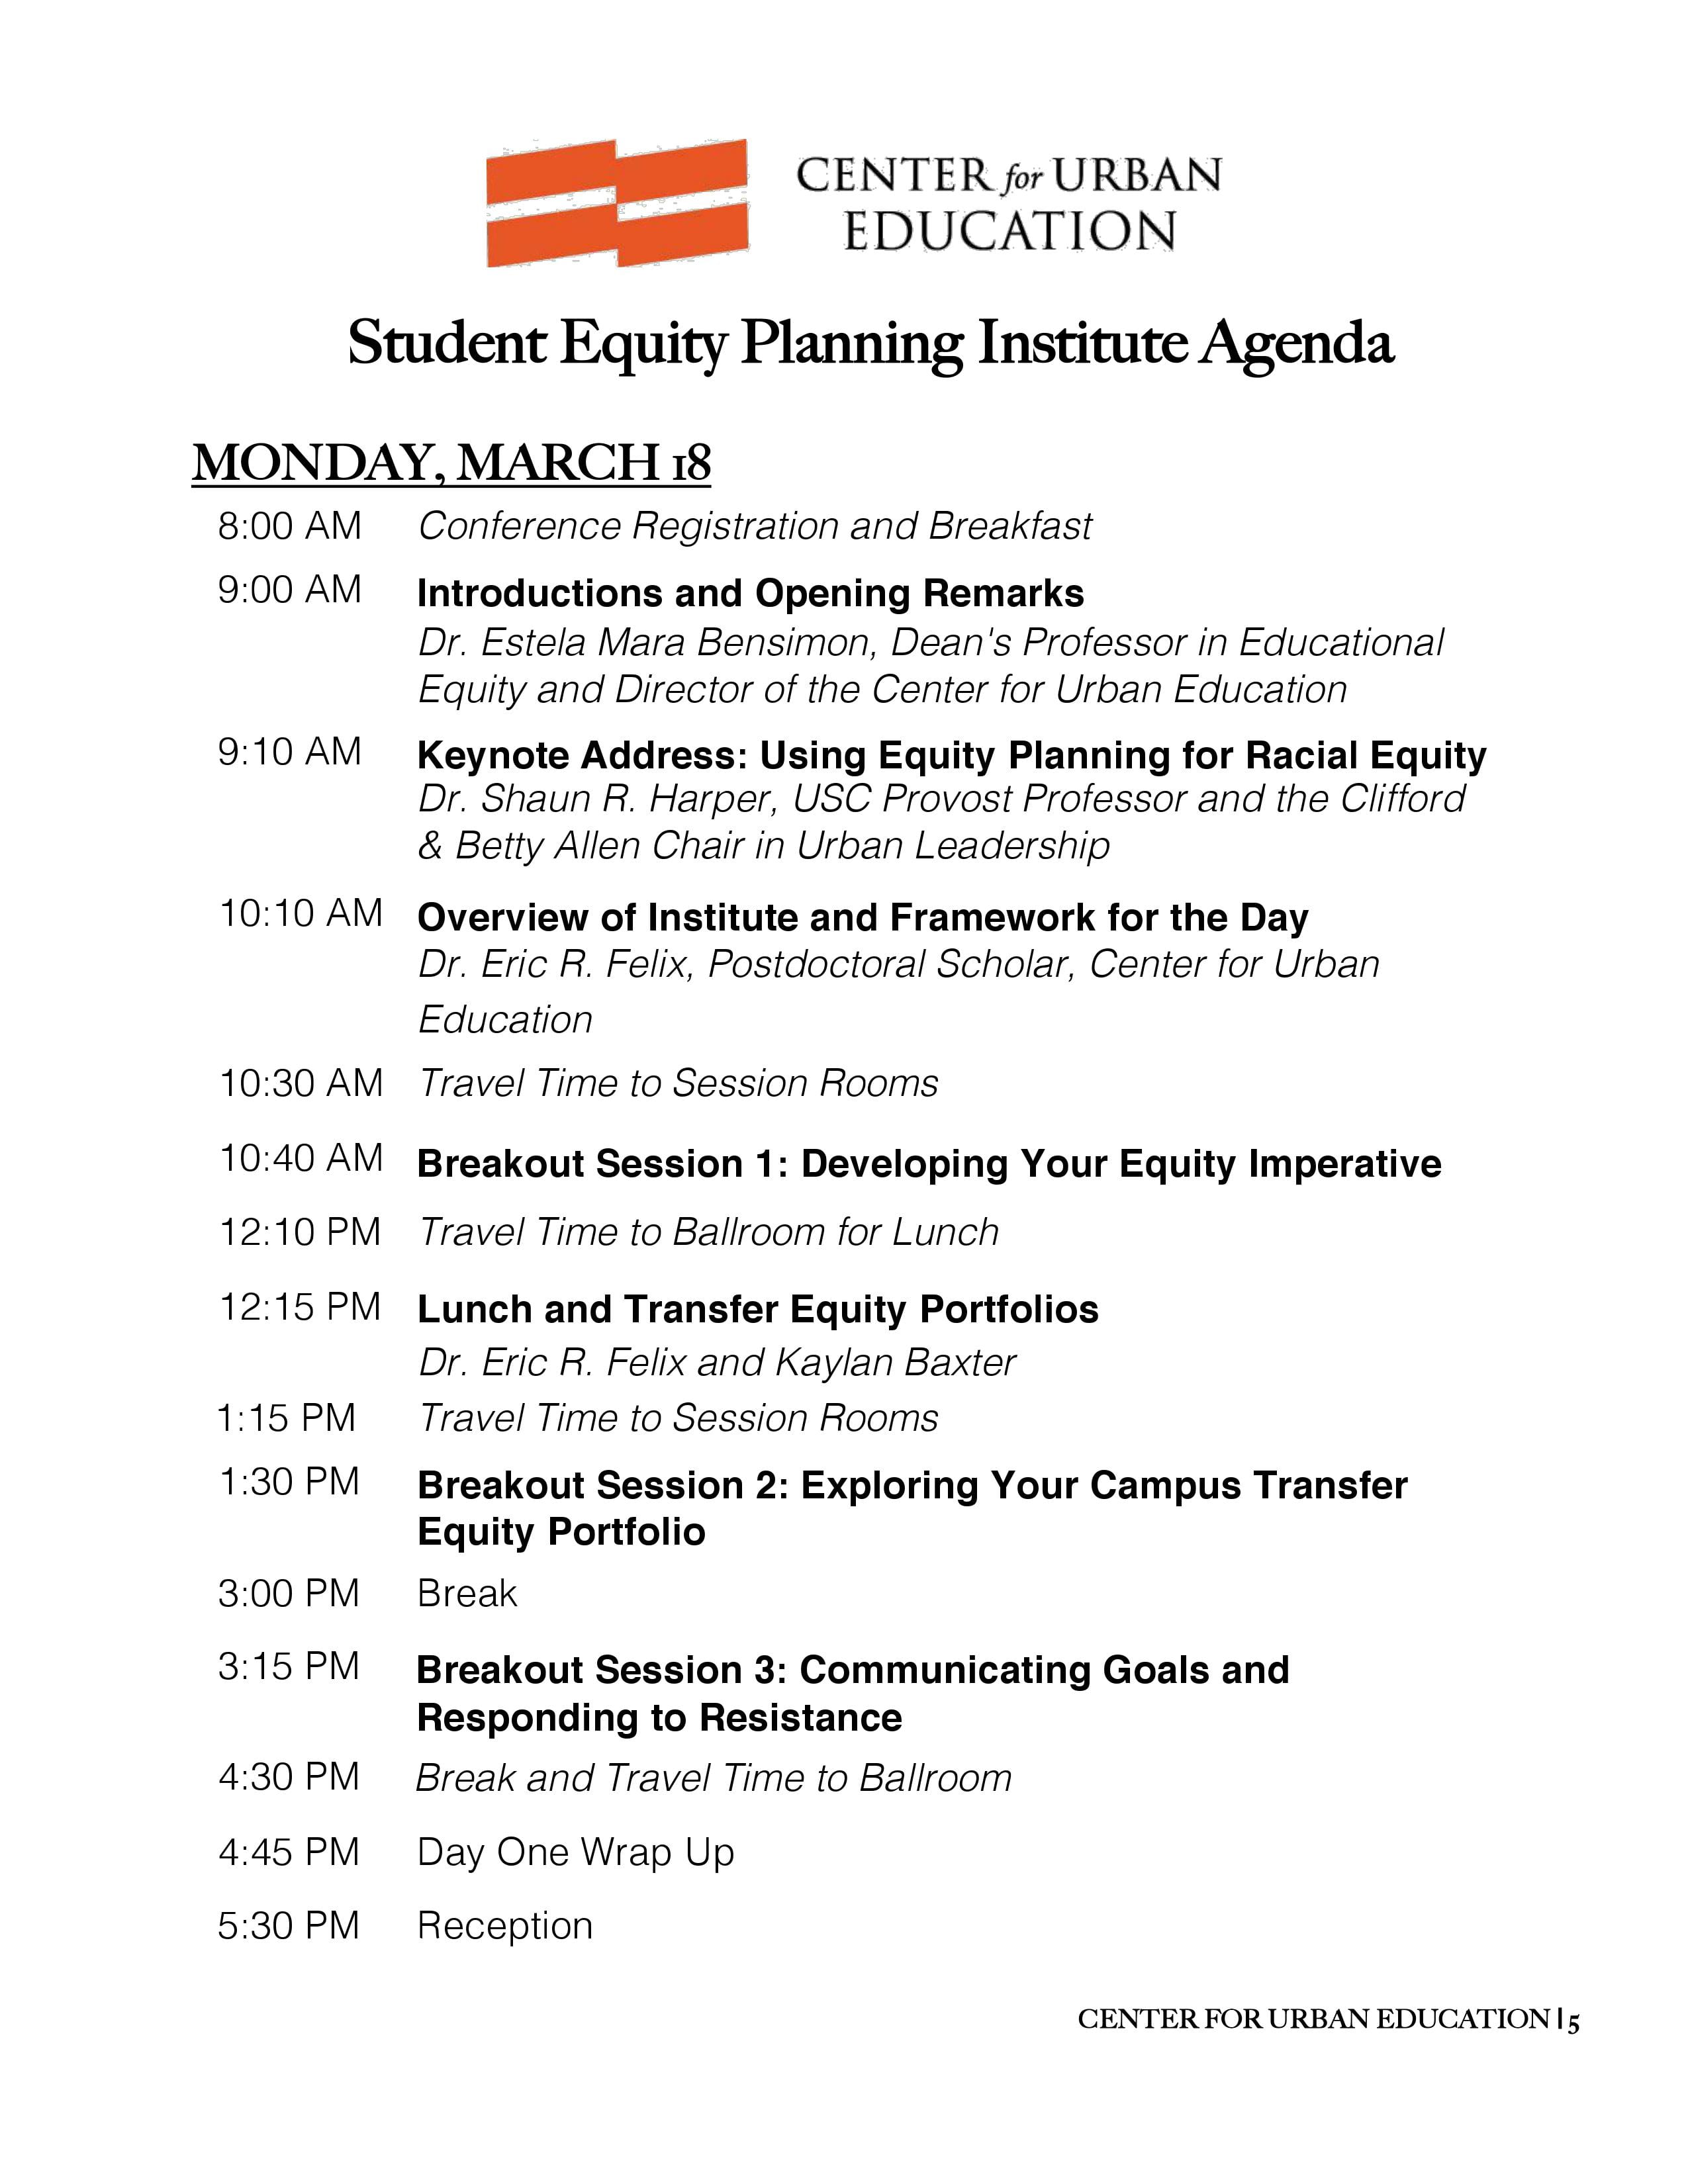 Student Equity Planning Institute (SEPI) 2019 | Center for